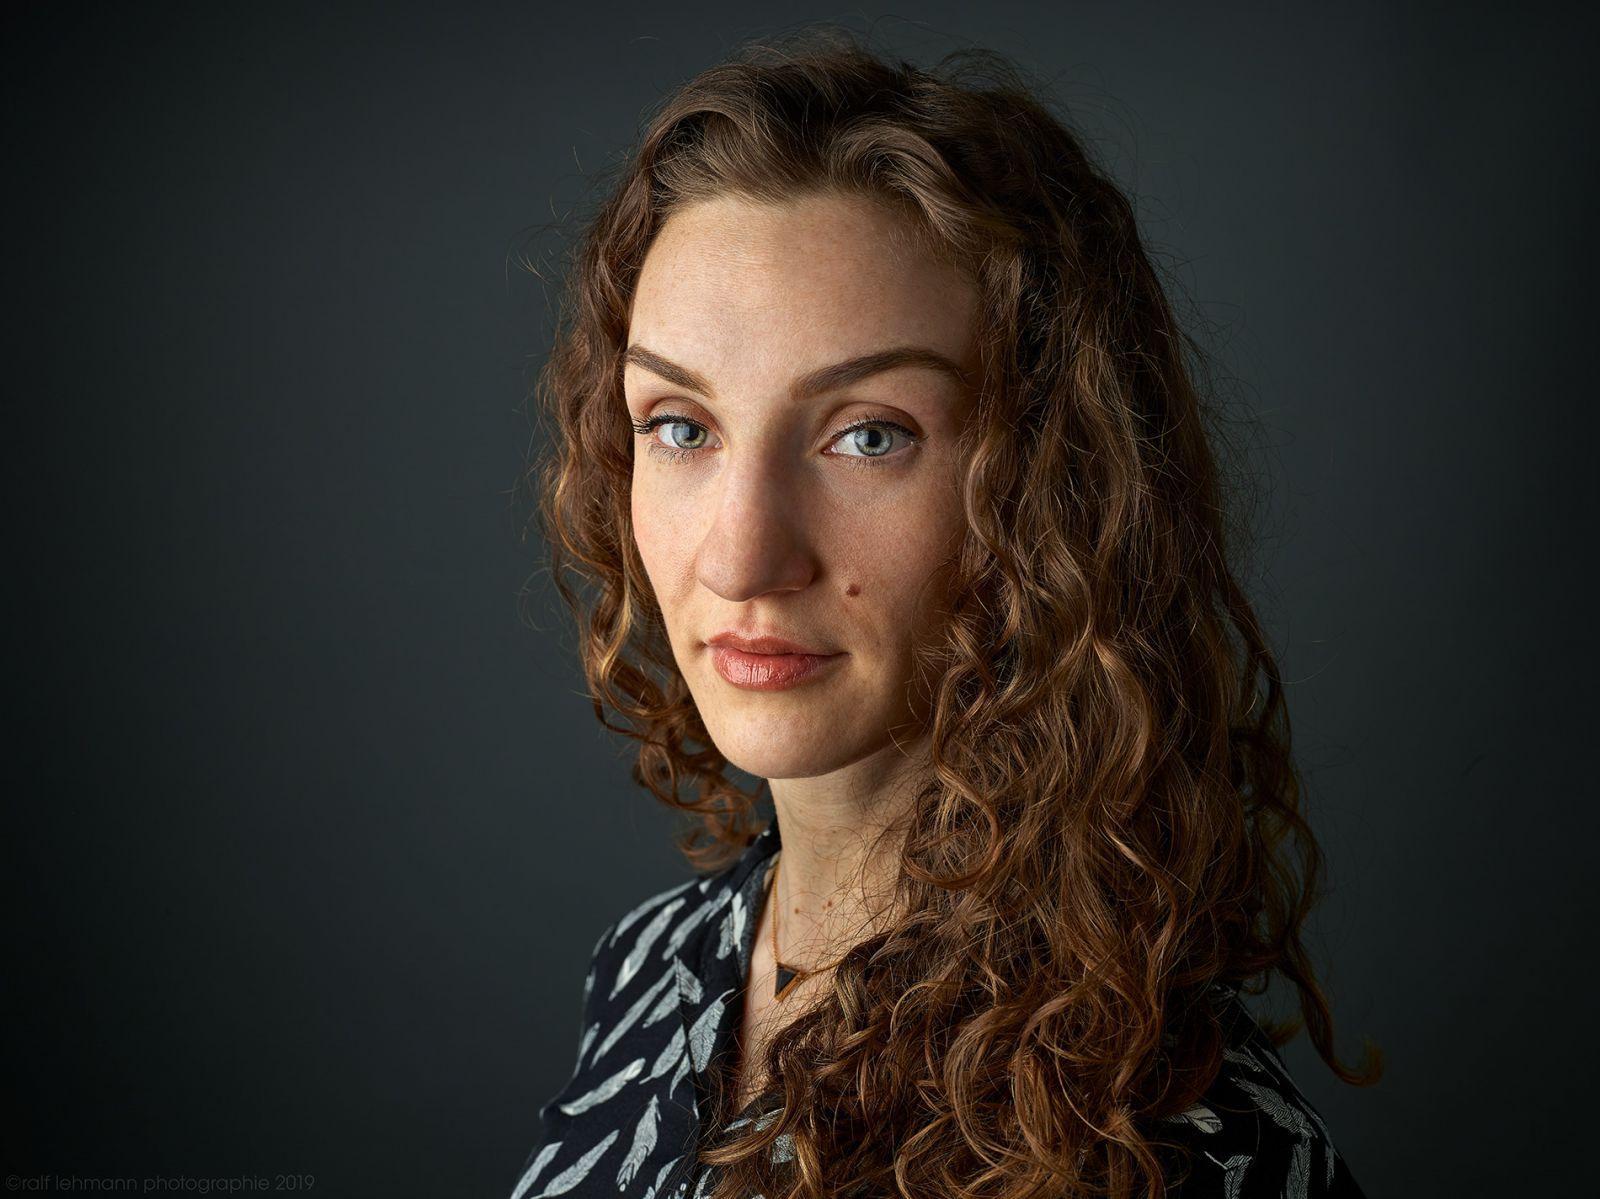 Portrait einer jungen, dunkelhaarigen Frau. Entstanden in Wuppertal.